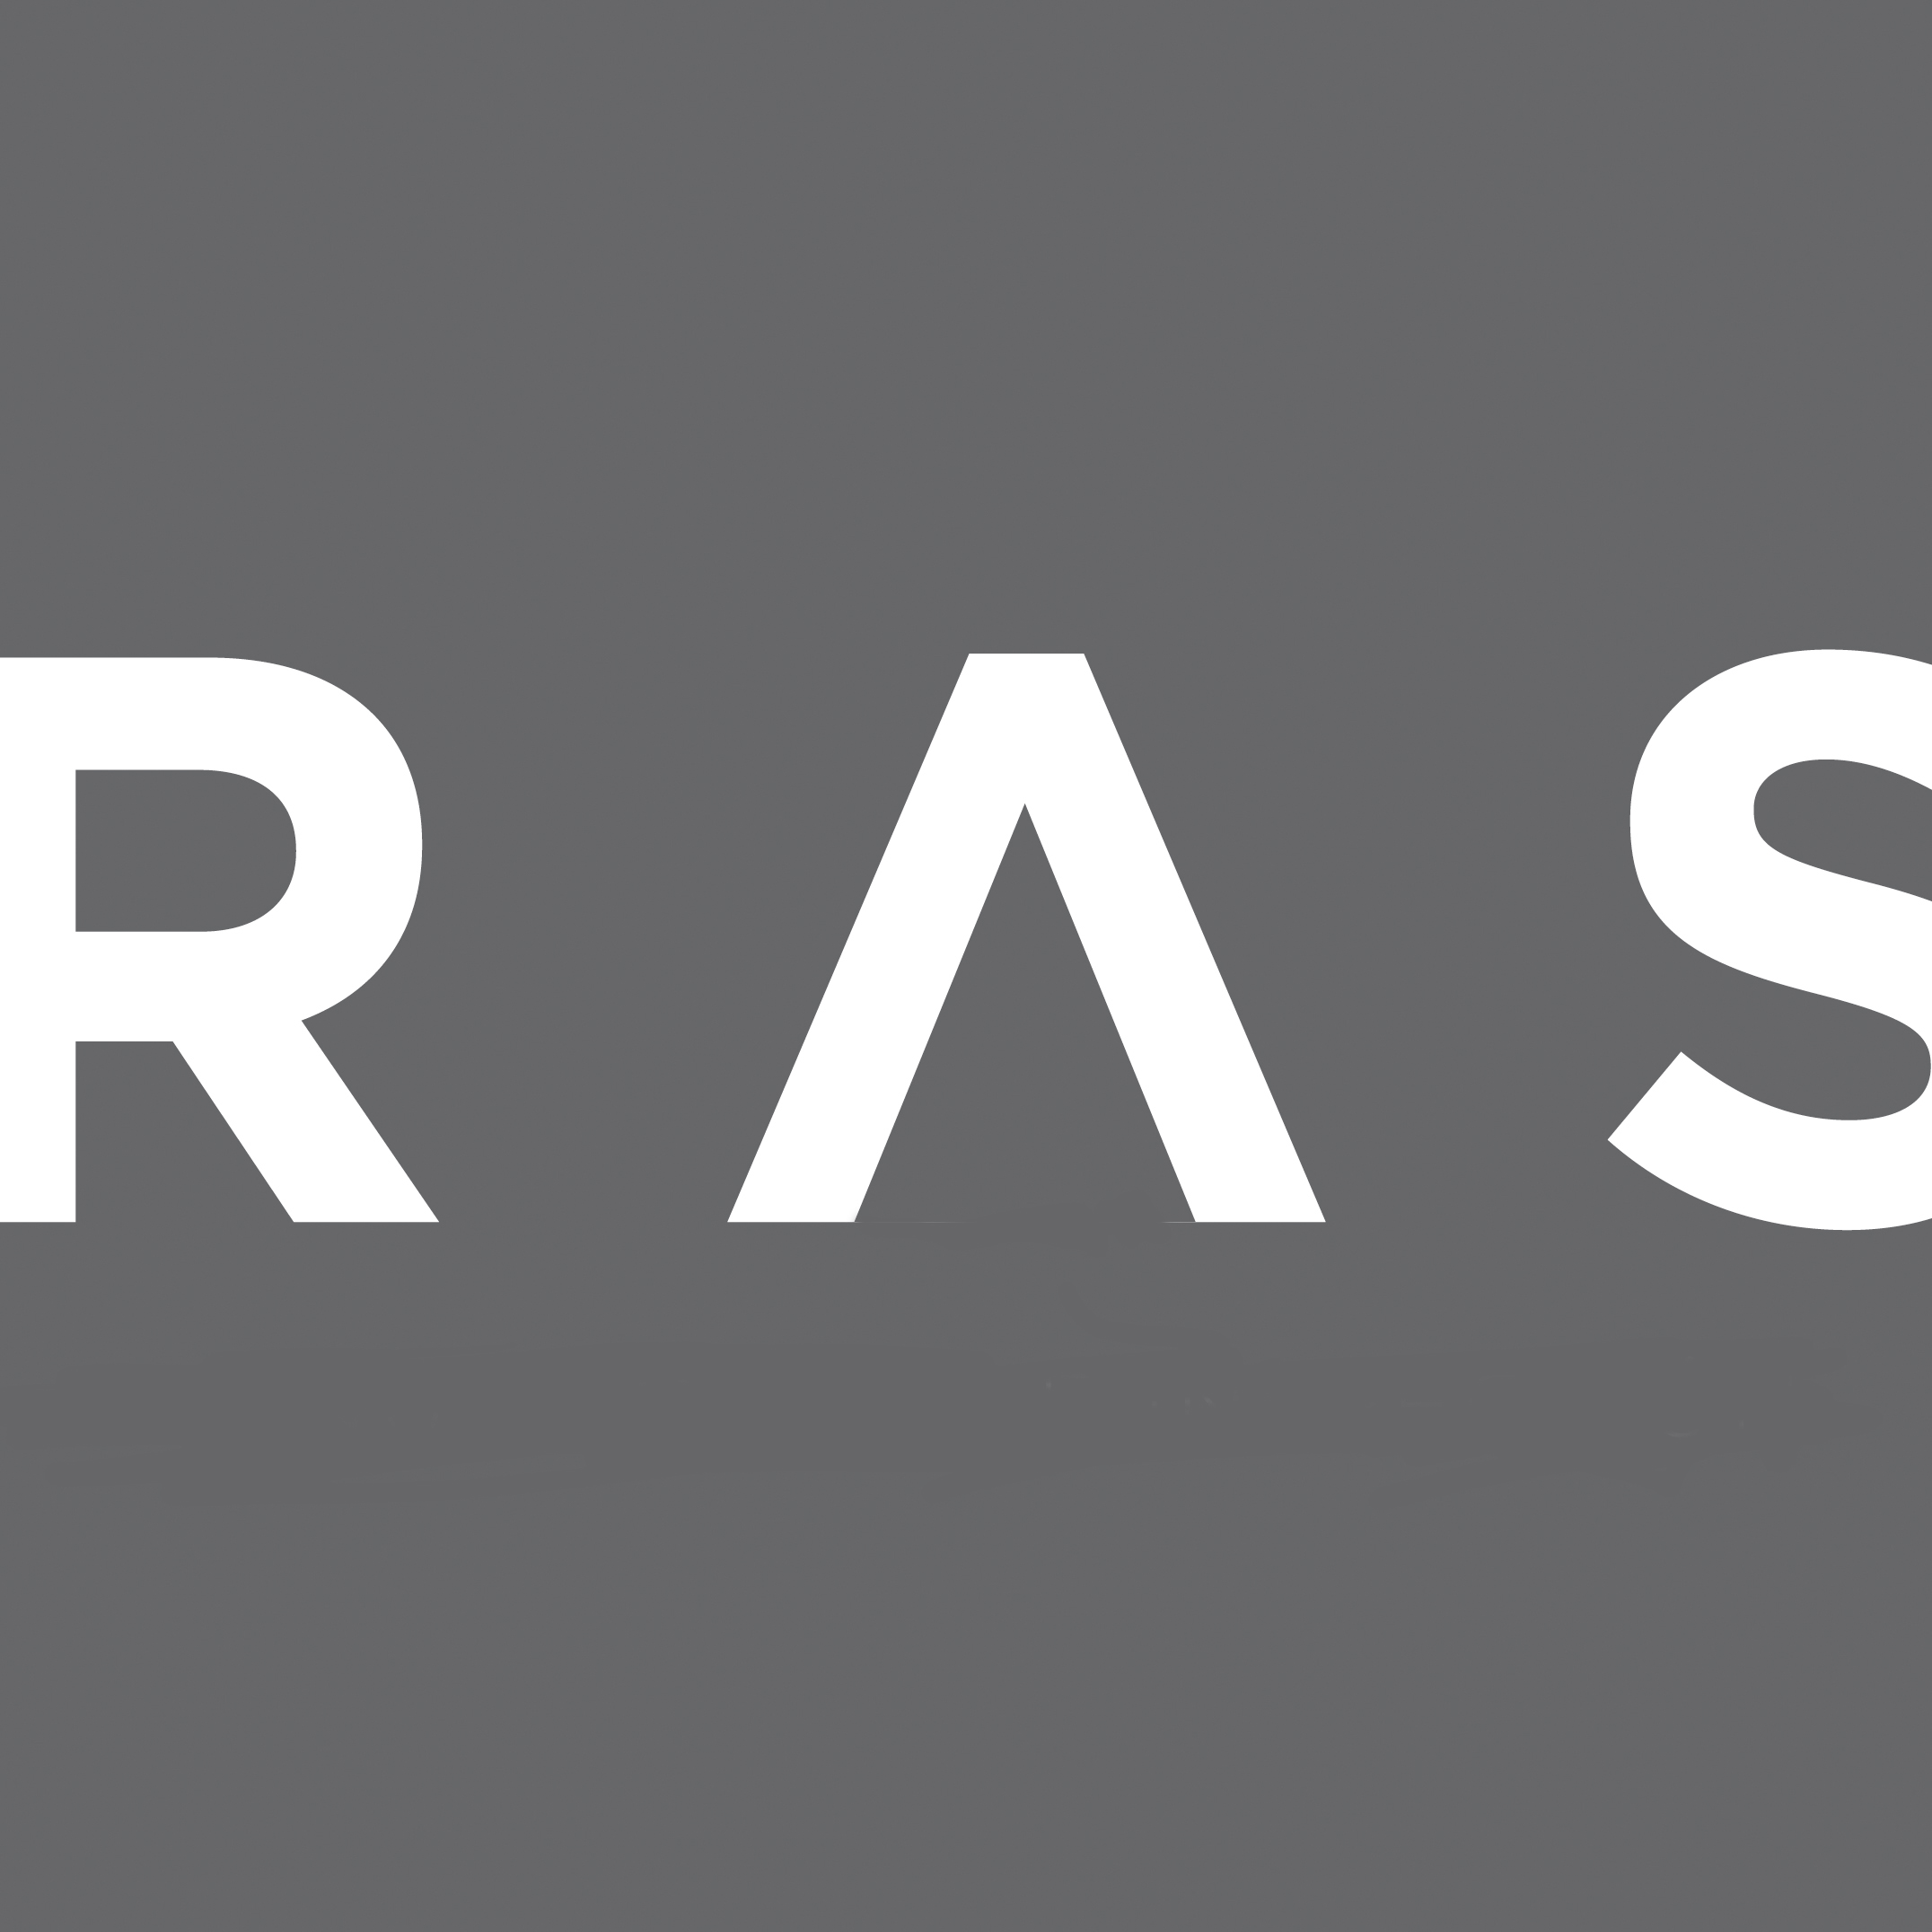 Ras Arquitectos Spa